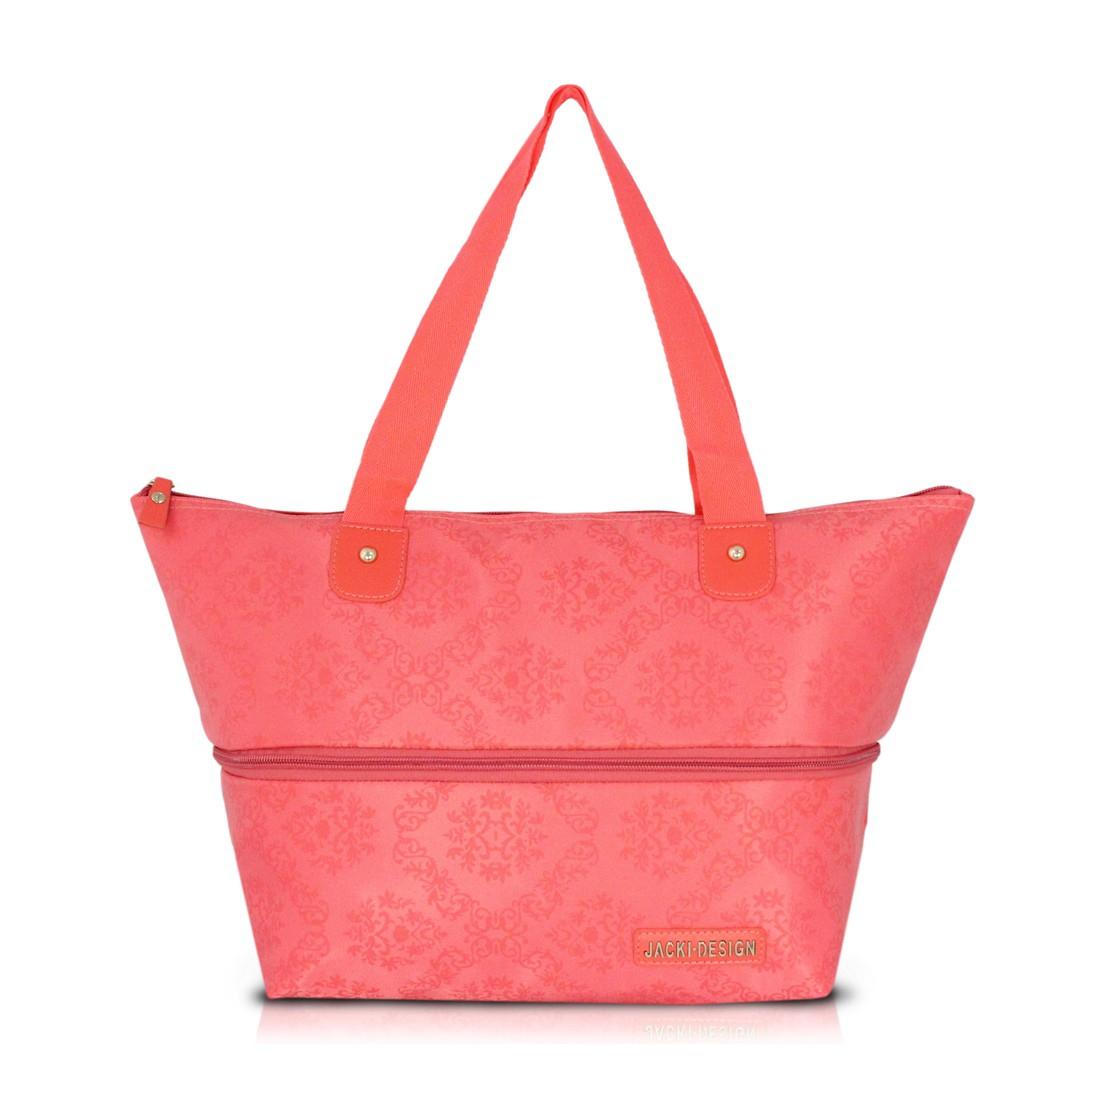 Bolsa Expansivel Essencial II Jacki Design